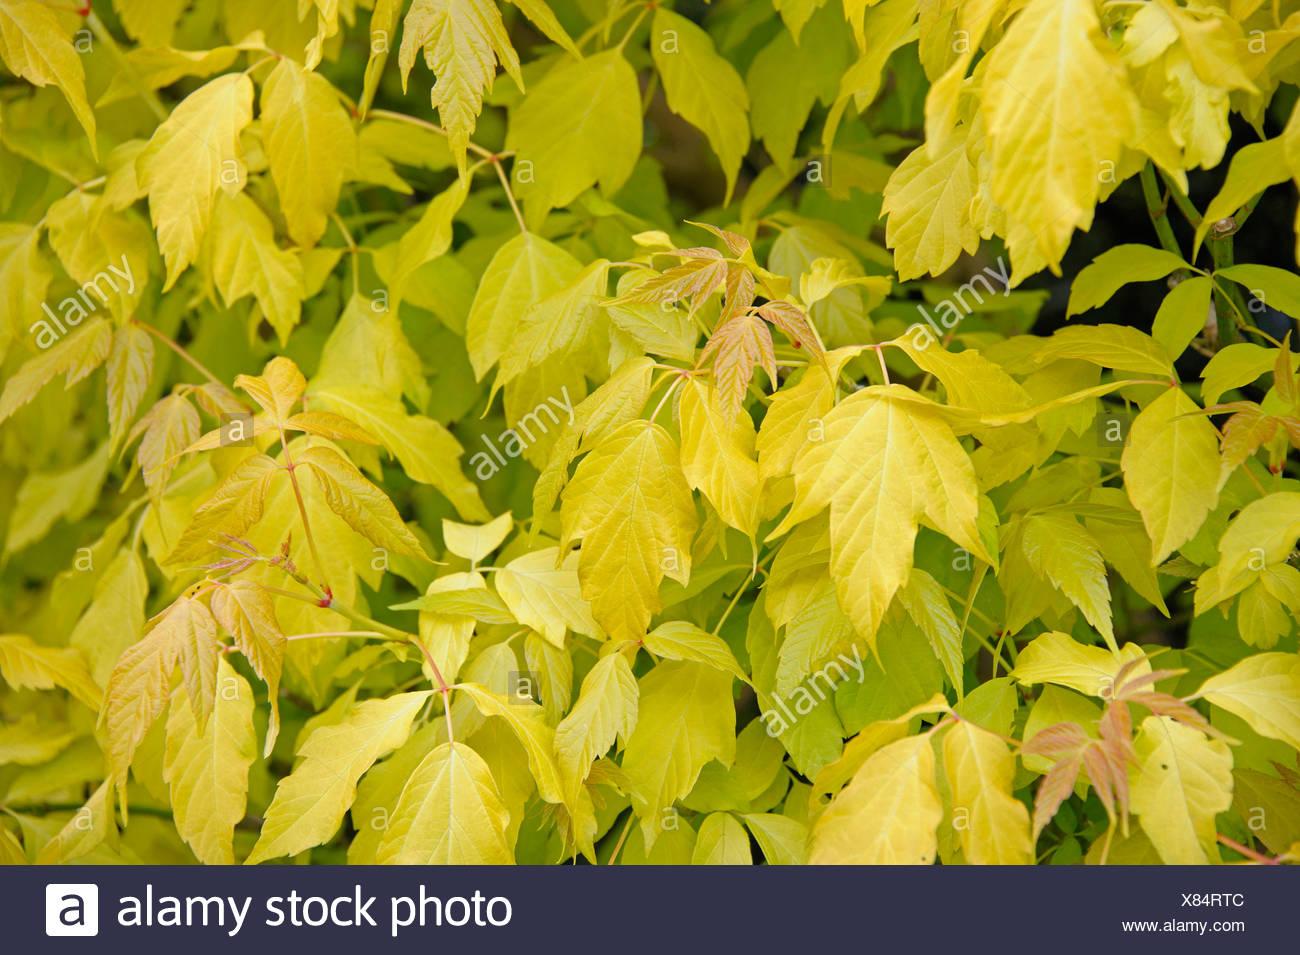 ashleaf maple, box elder (Acer negundo 'Odessanum', Acer negundo Odessanum), cultivar Odessanum - Stock Image